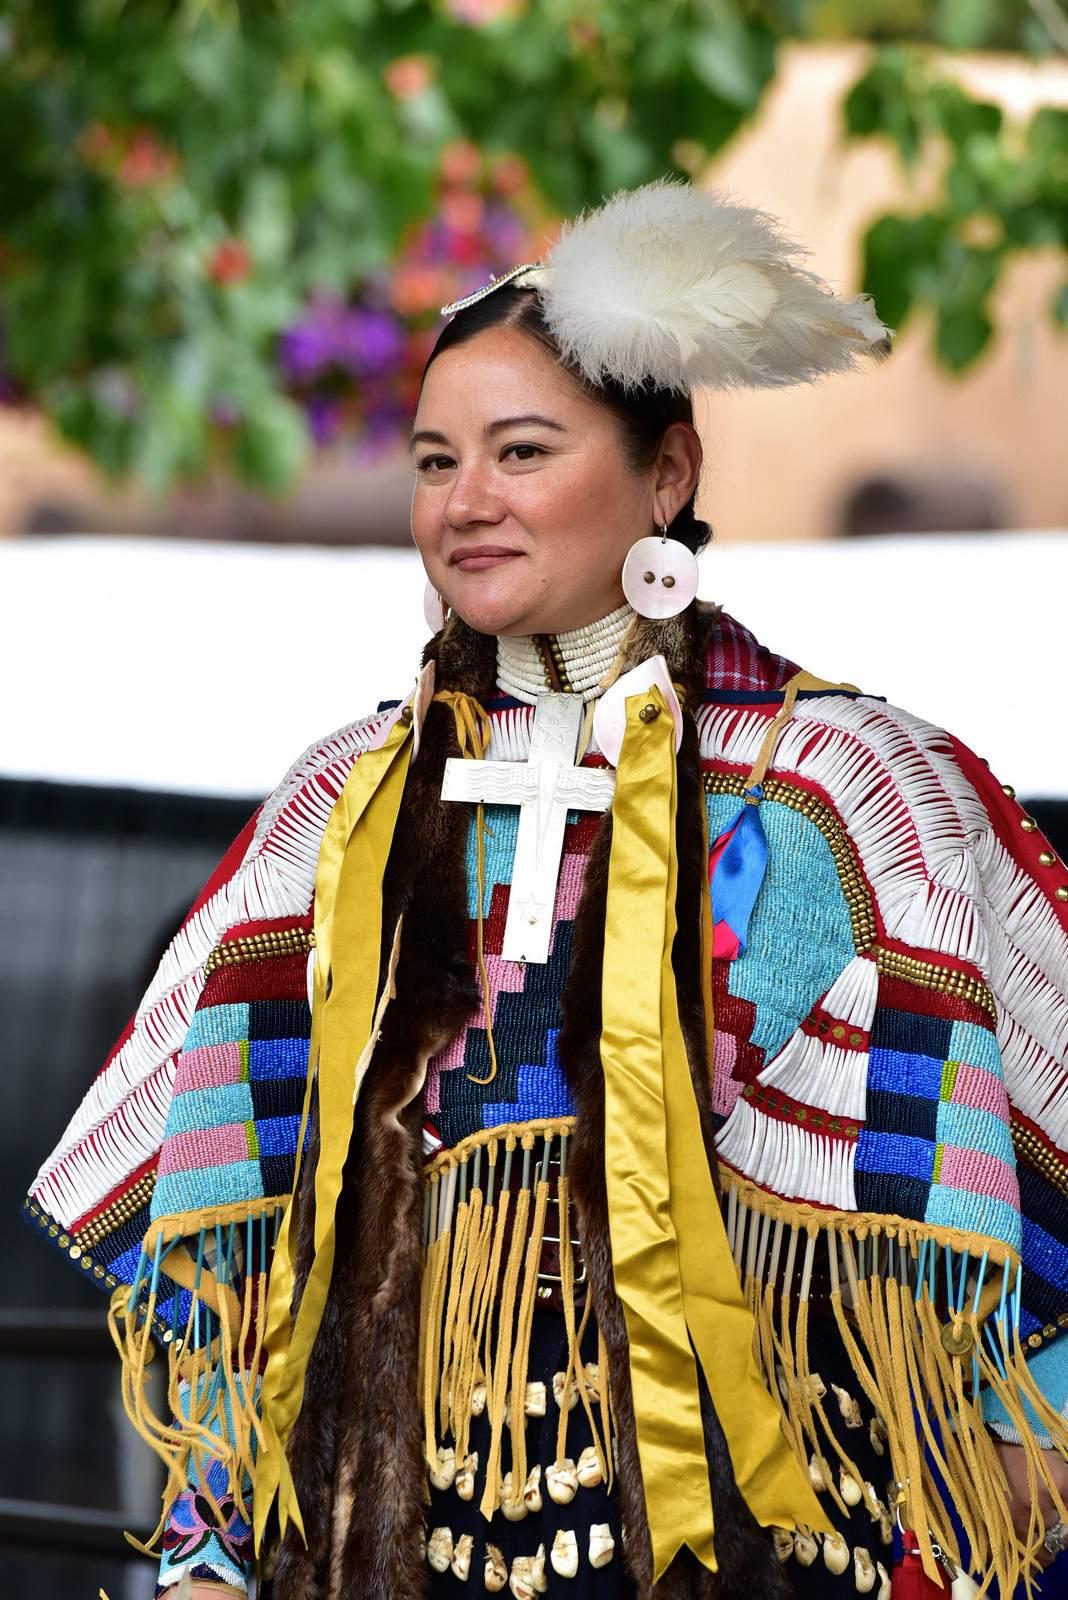 native american clothing8 Native American Clothing Contest at Santa Fe Indian Market